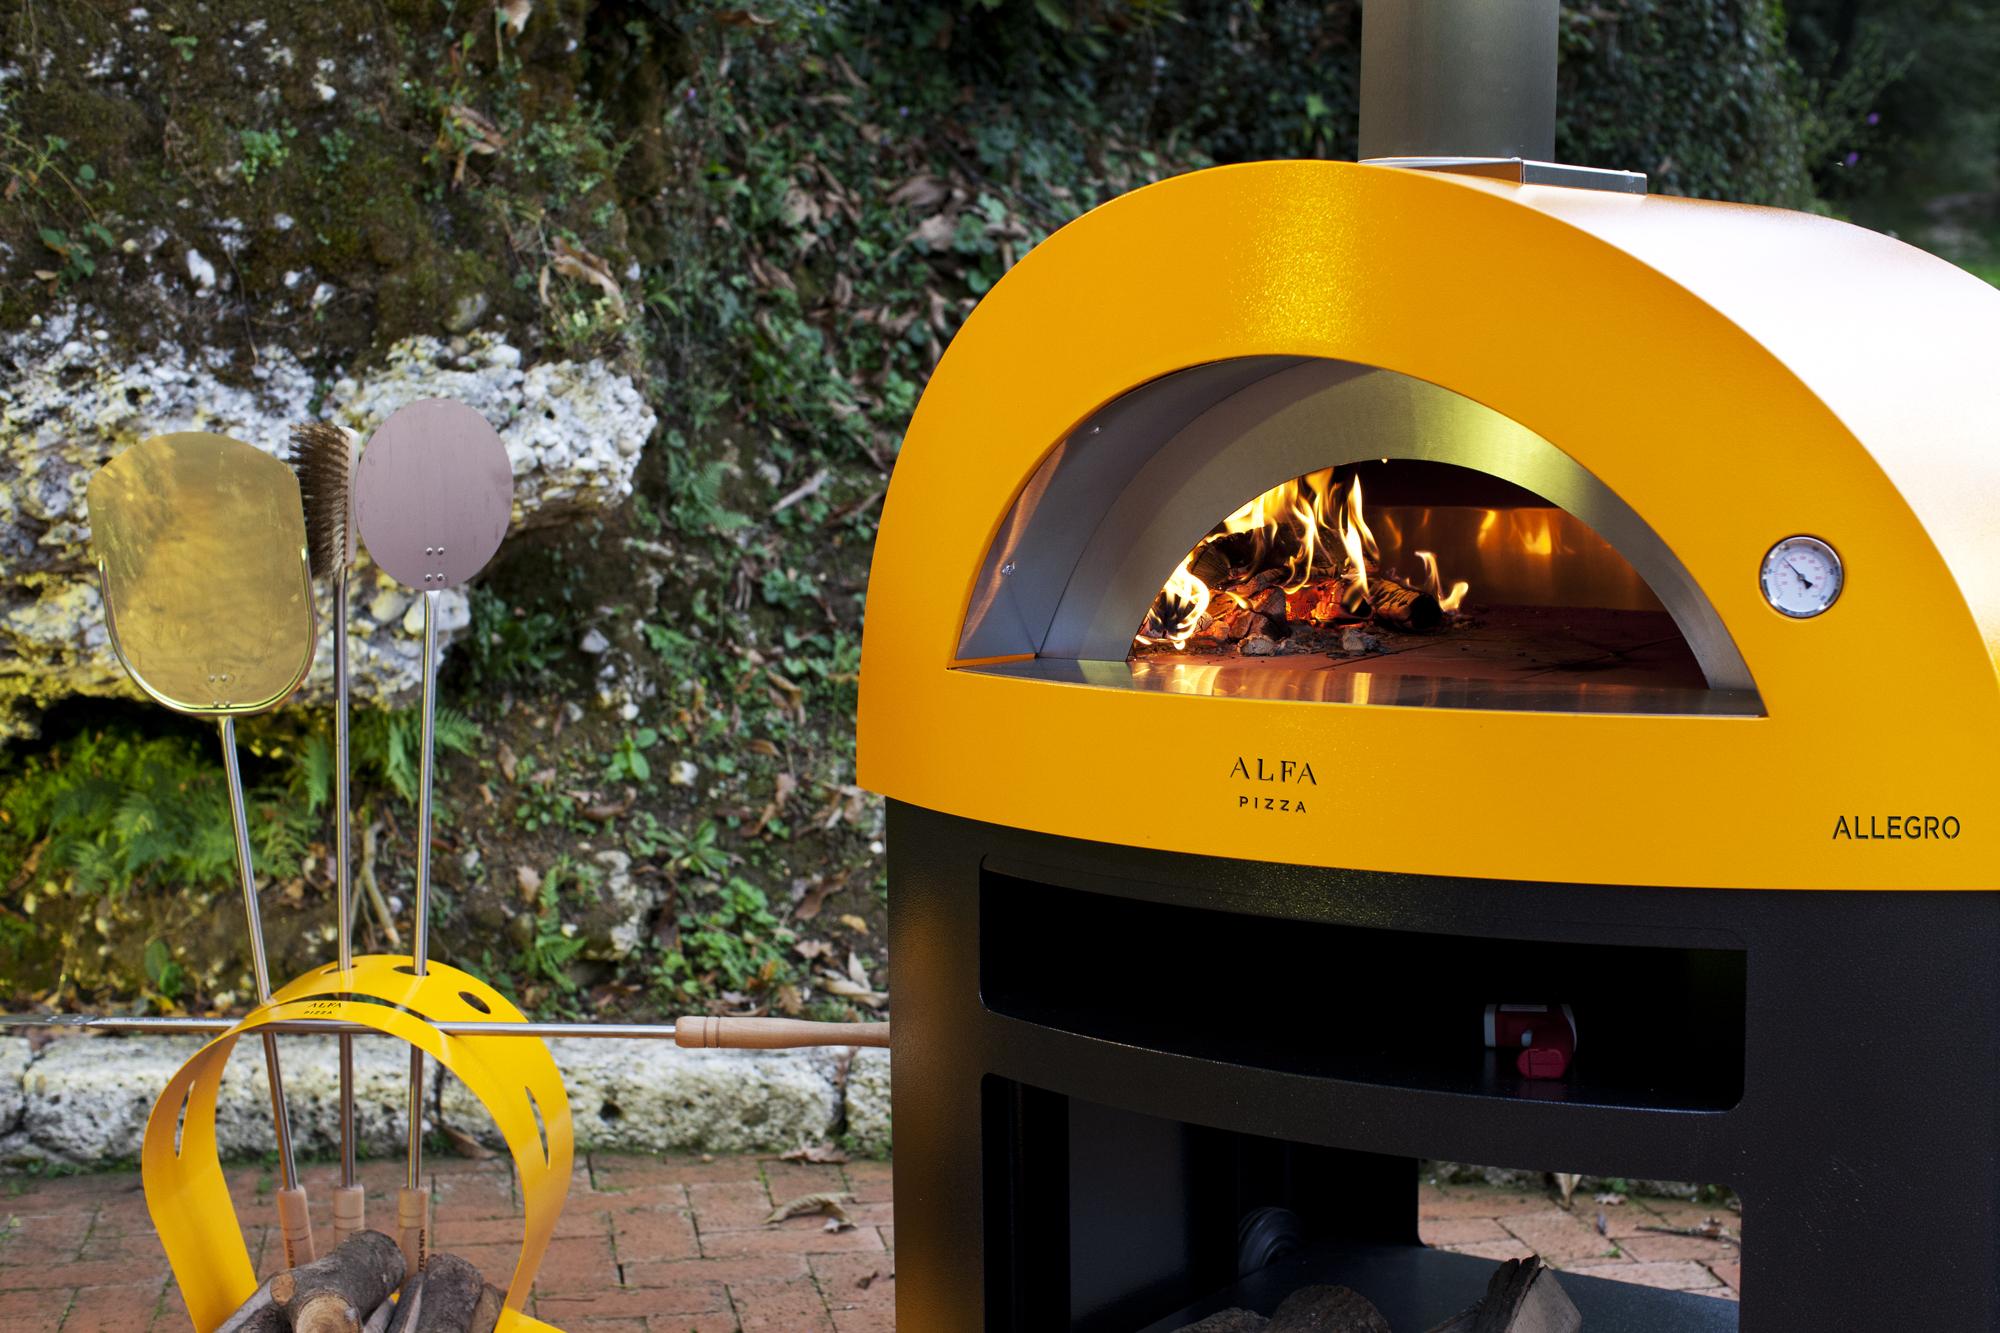 Alfa Pizza Allegro Pizza Oven Great Outdoors Bbq Co